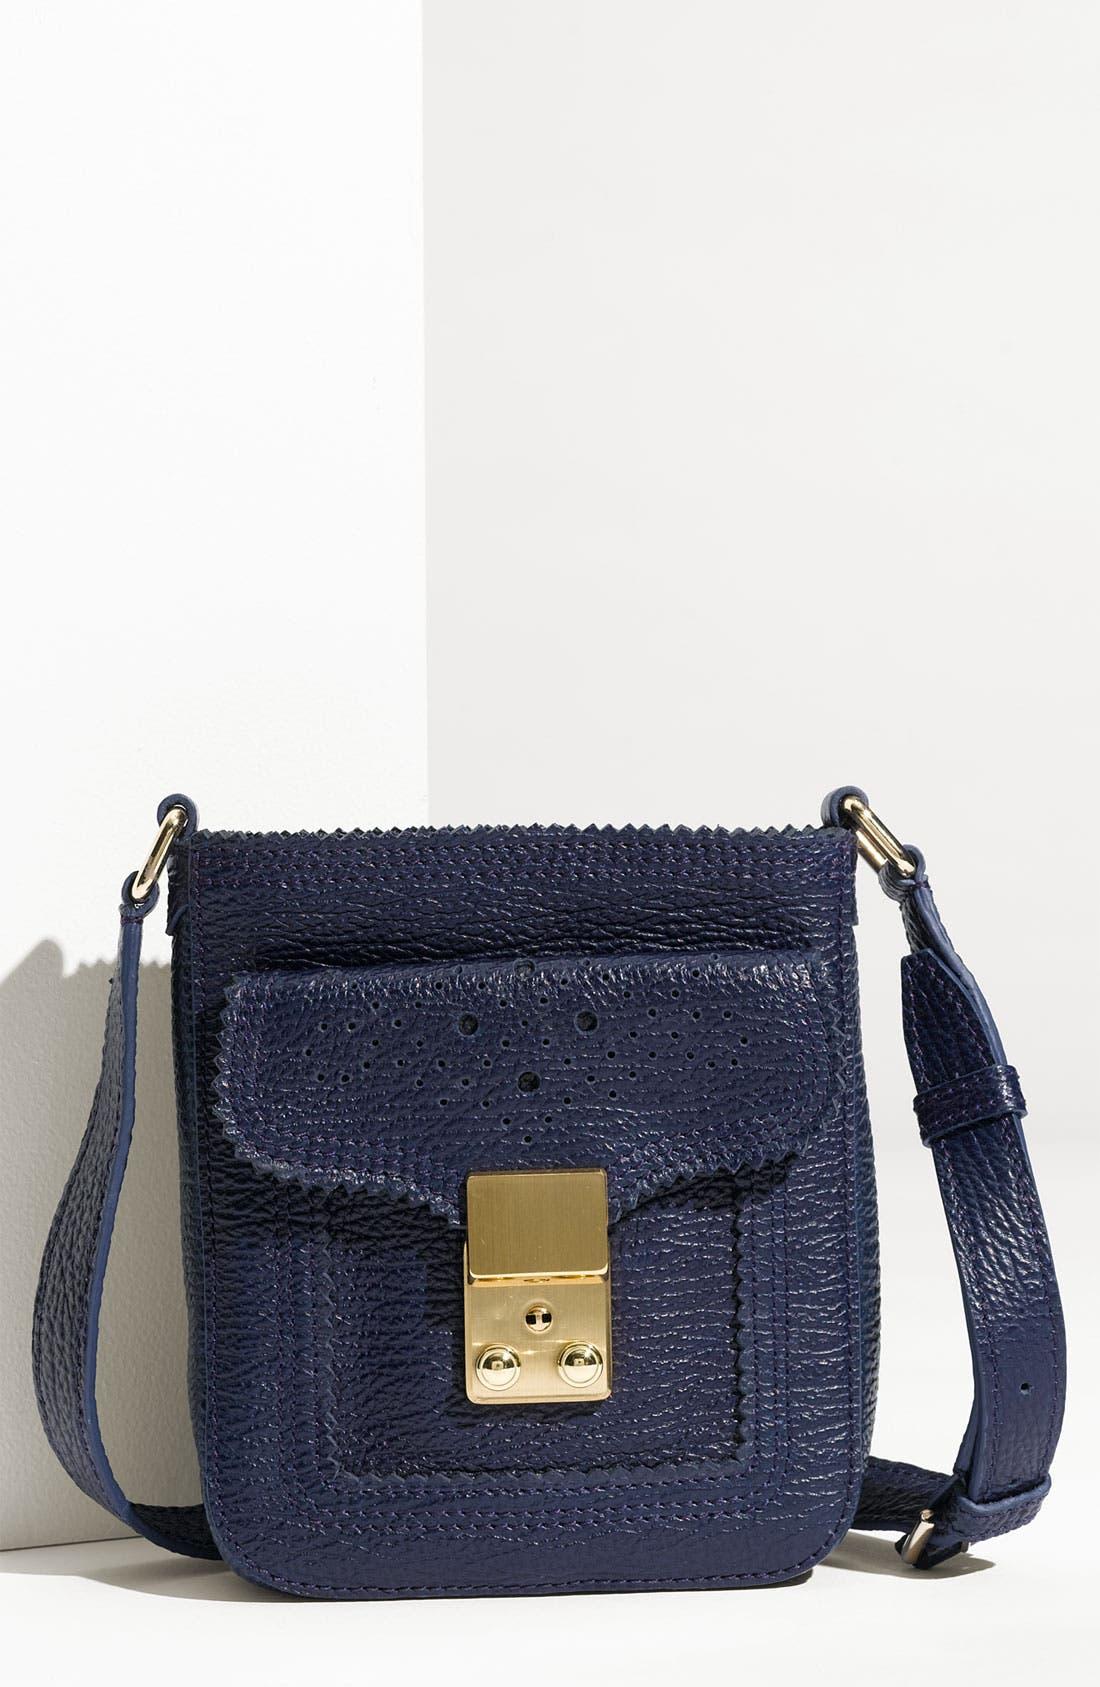 Main Image - 3.1 Phillip Lim 'Pashli Camera' Textured Calfskin Crossbody Bag